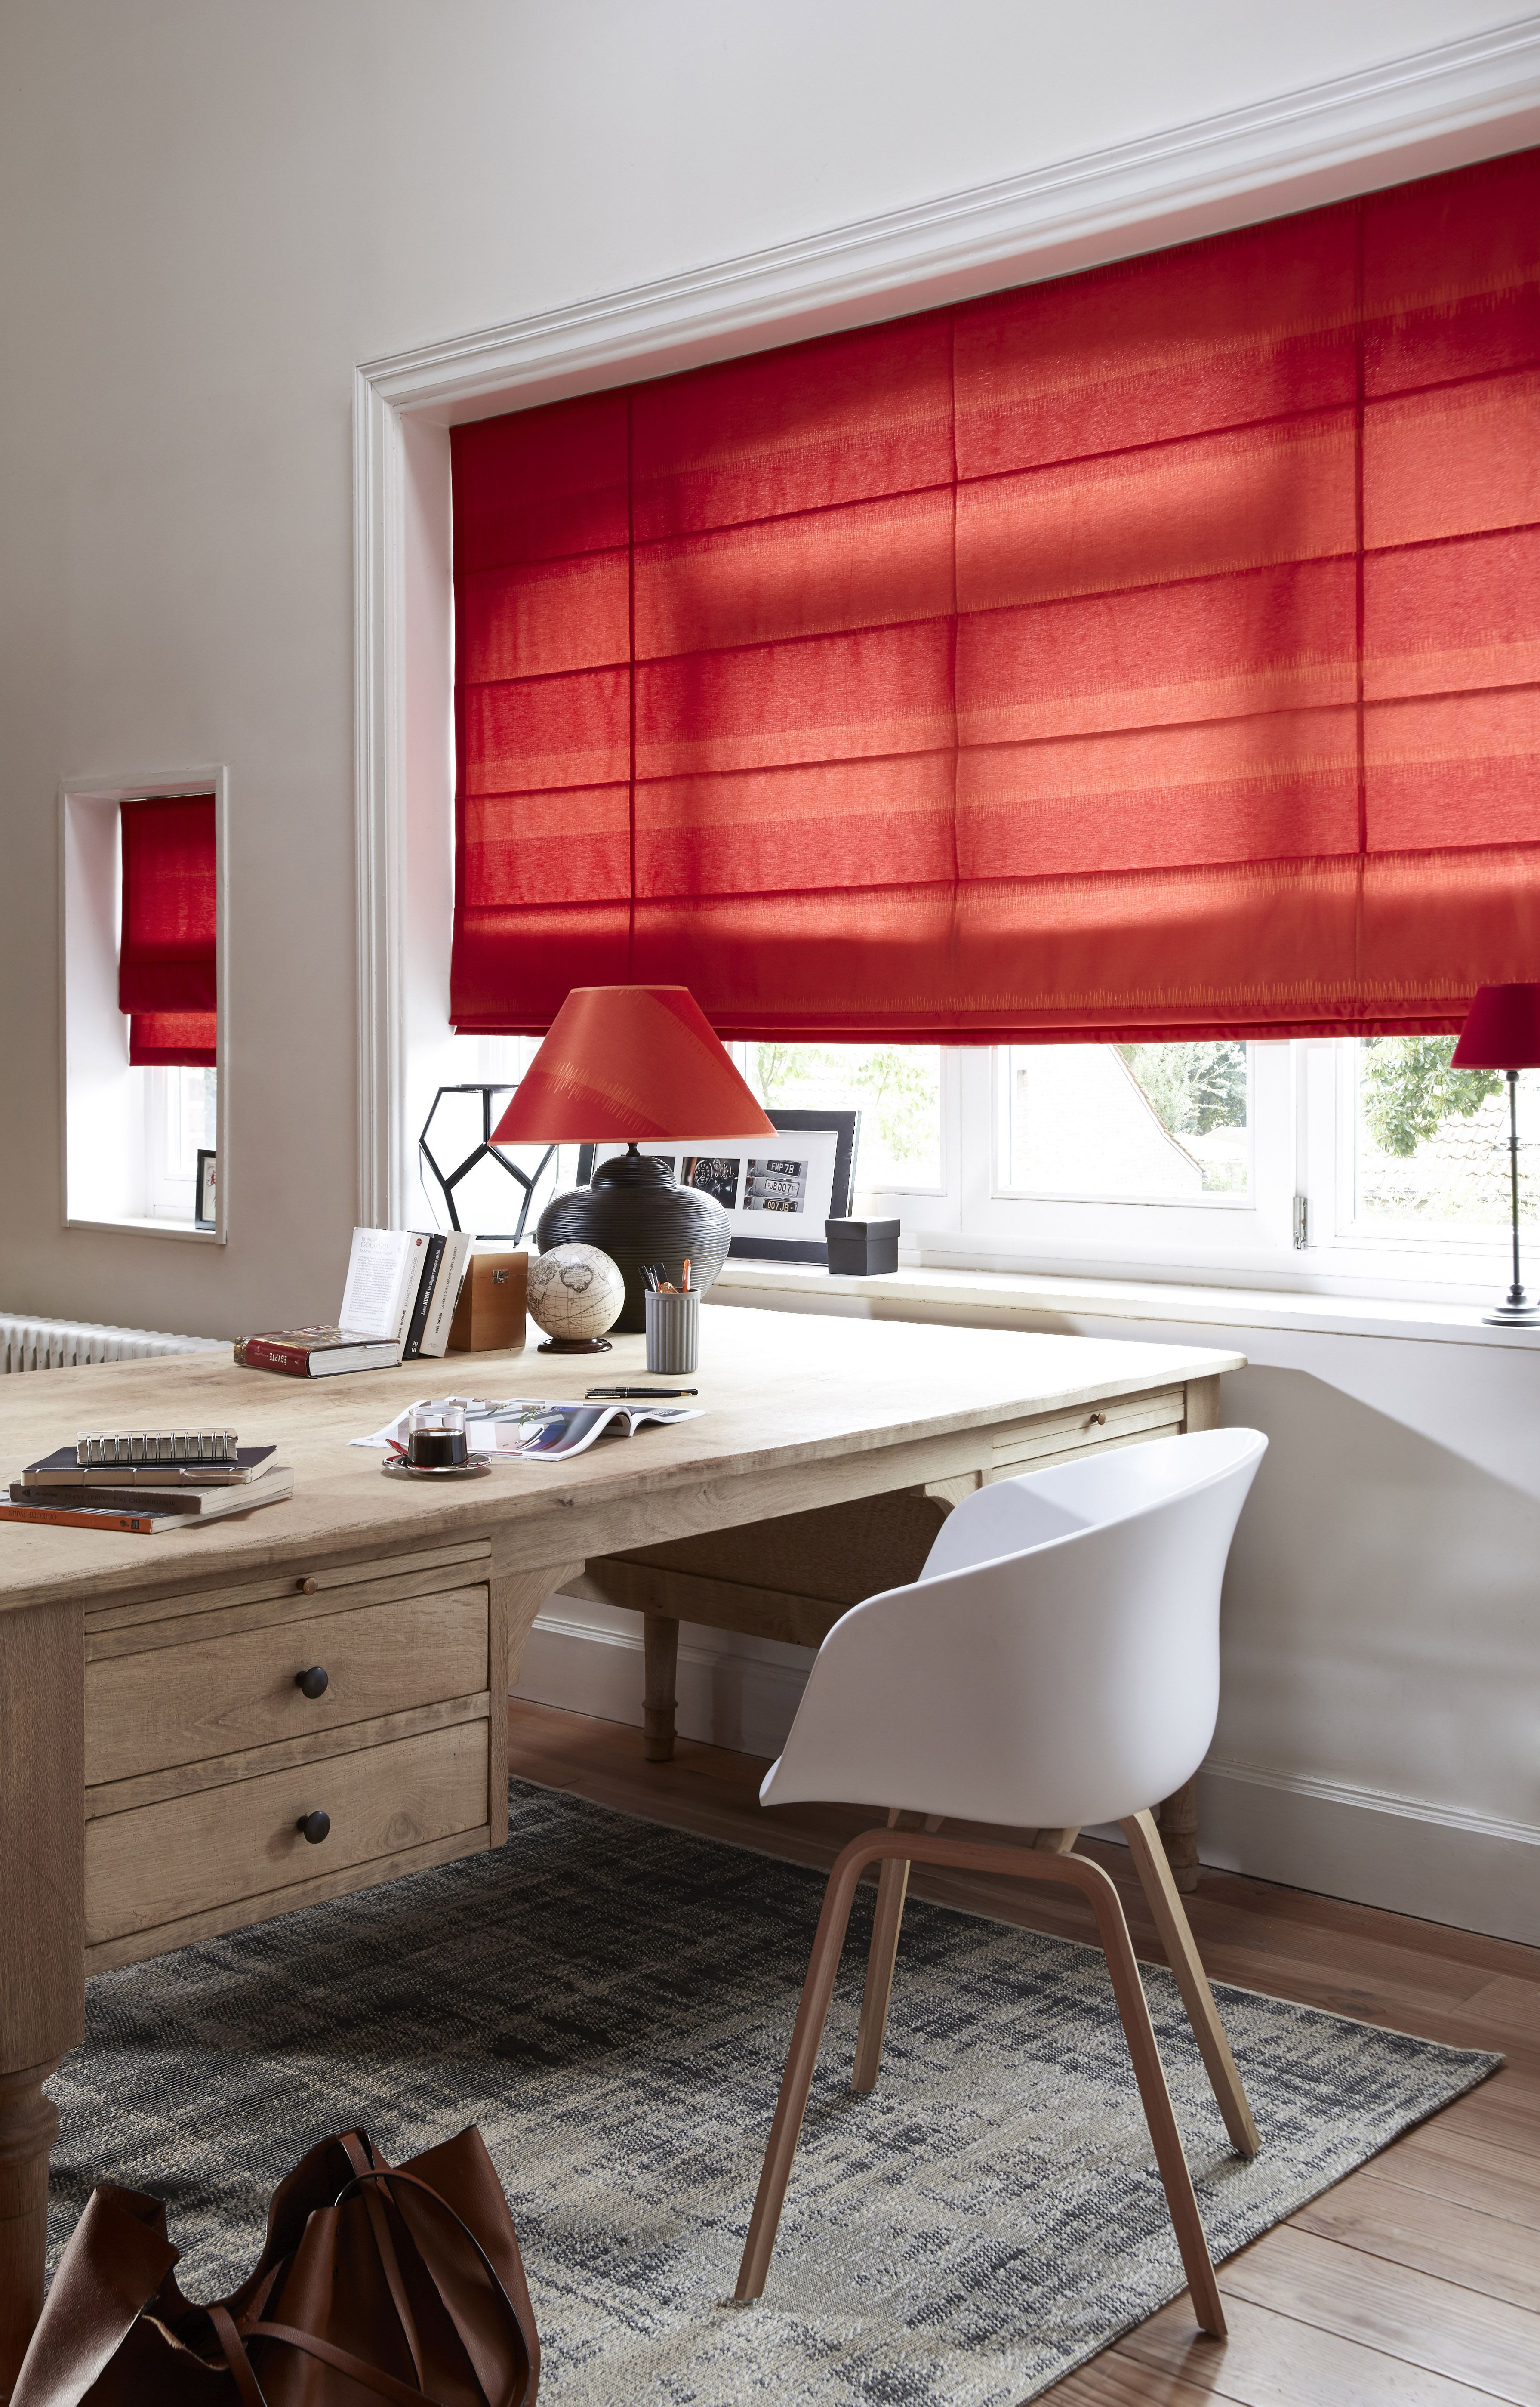 chez vous custom curtains. Black Bedroom Furniture Sets. Home Design Ideas